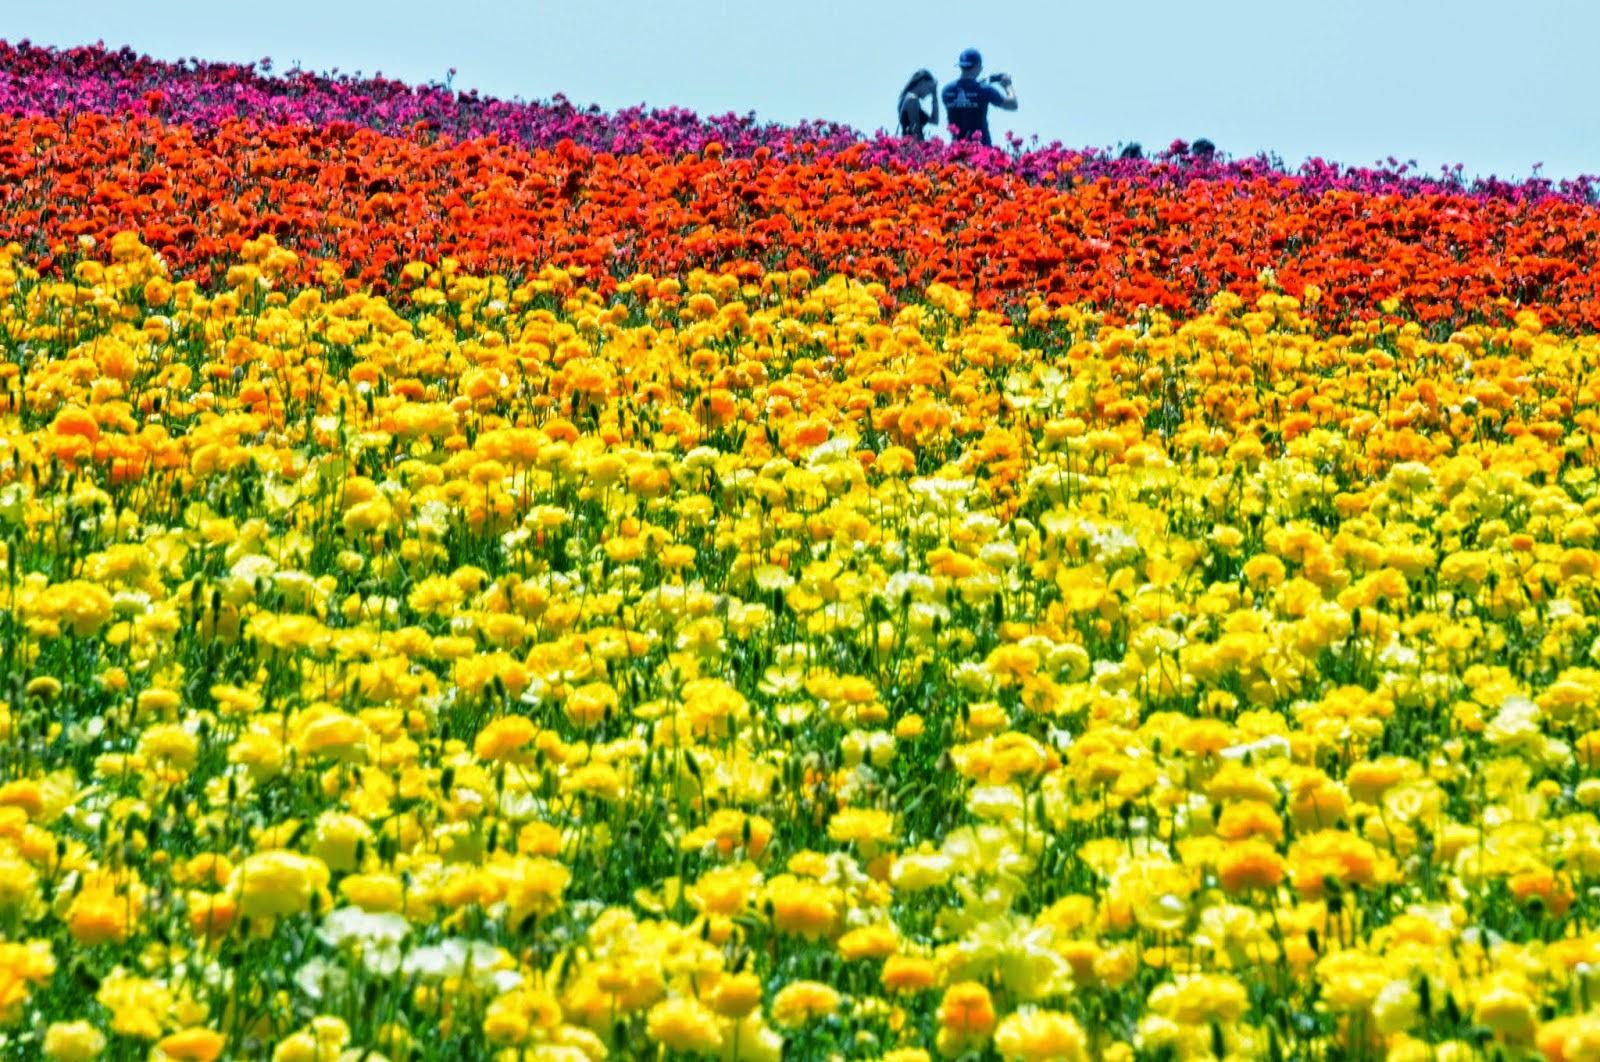 Go Hike It The Carlsbad Flower Fields Hiking Trail